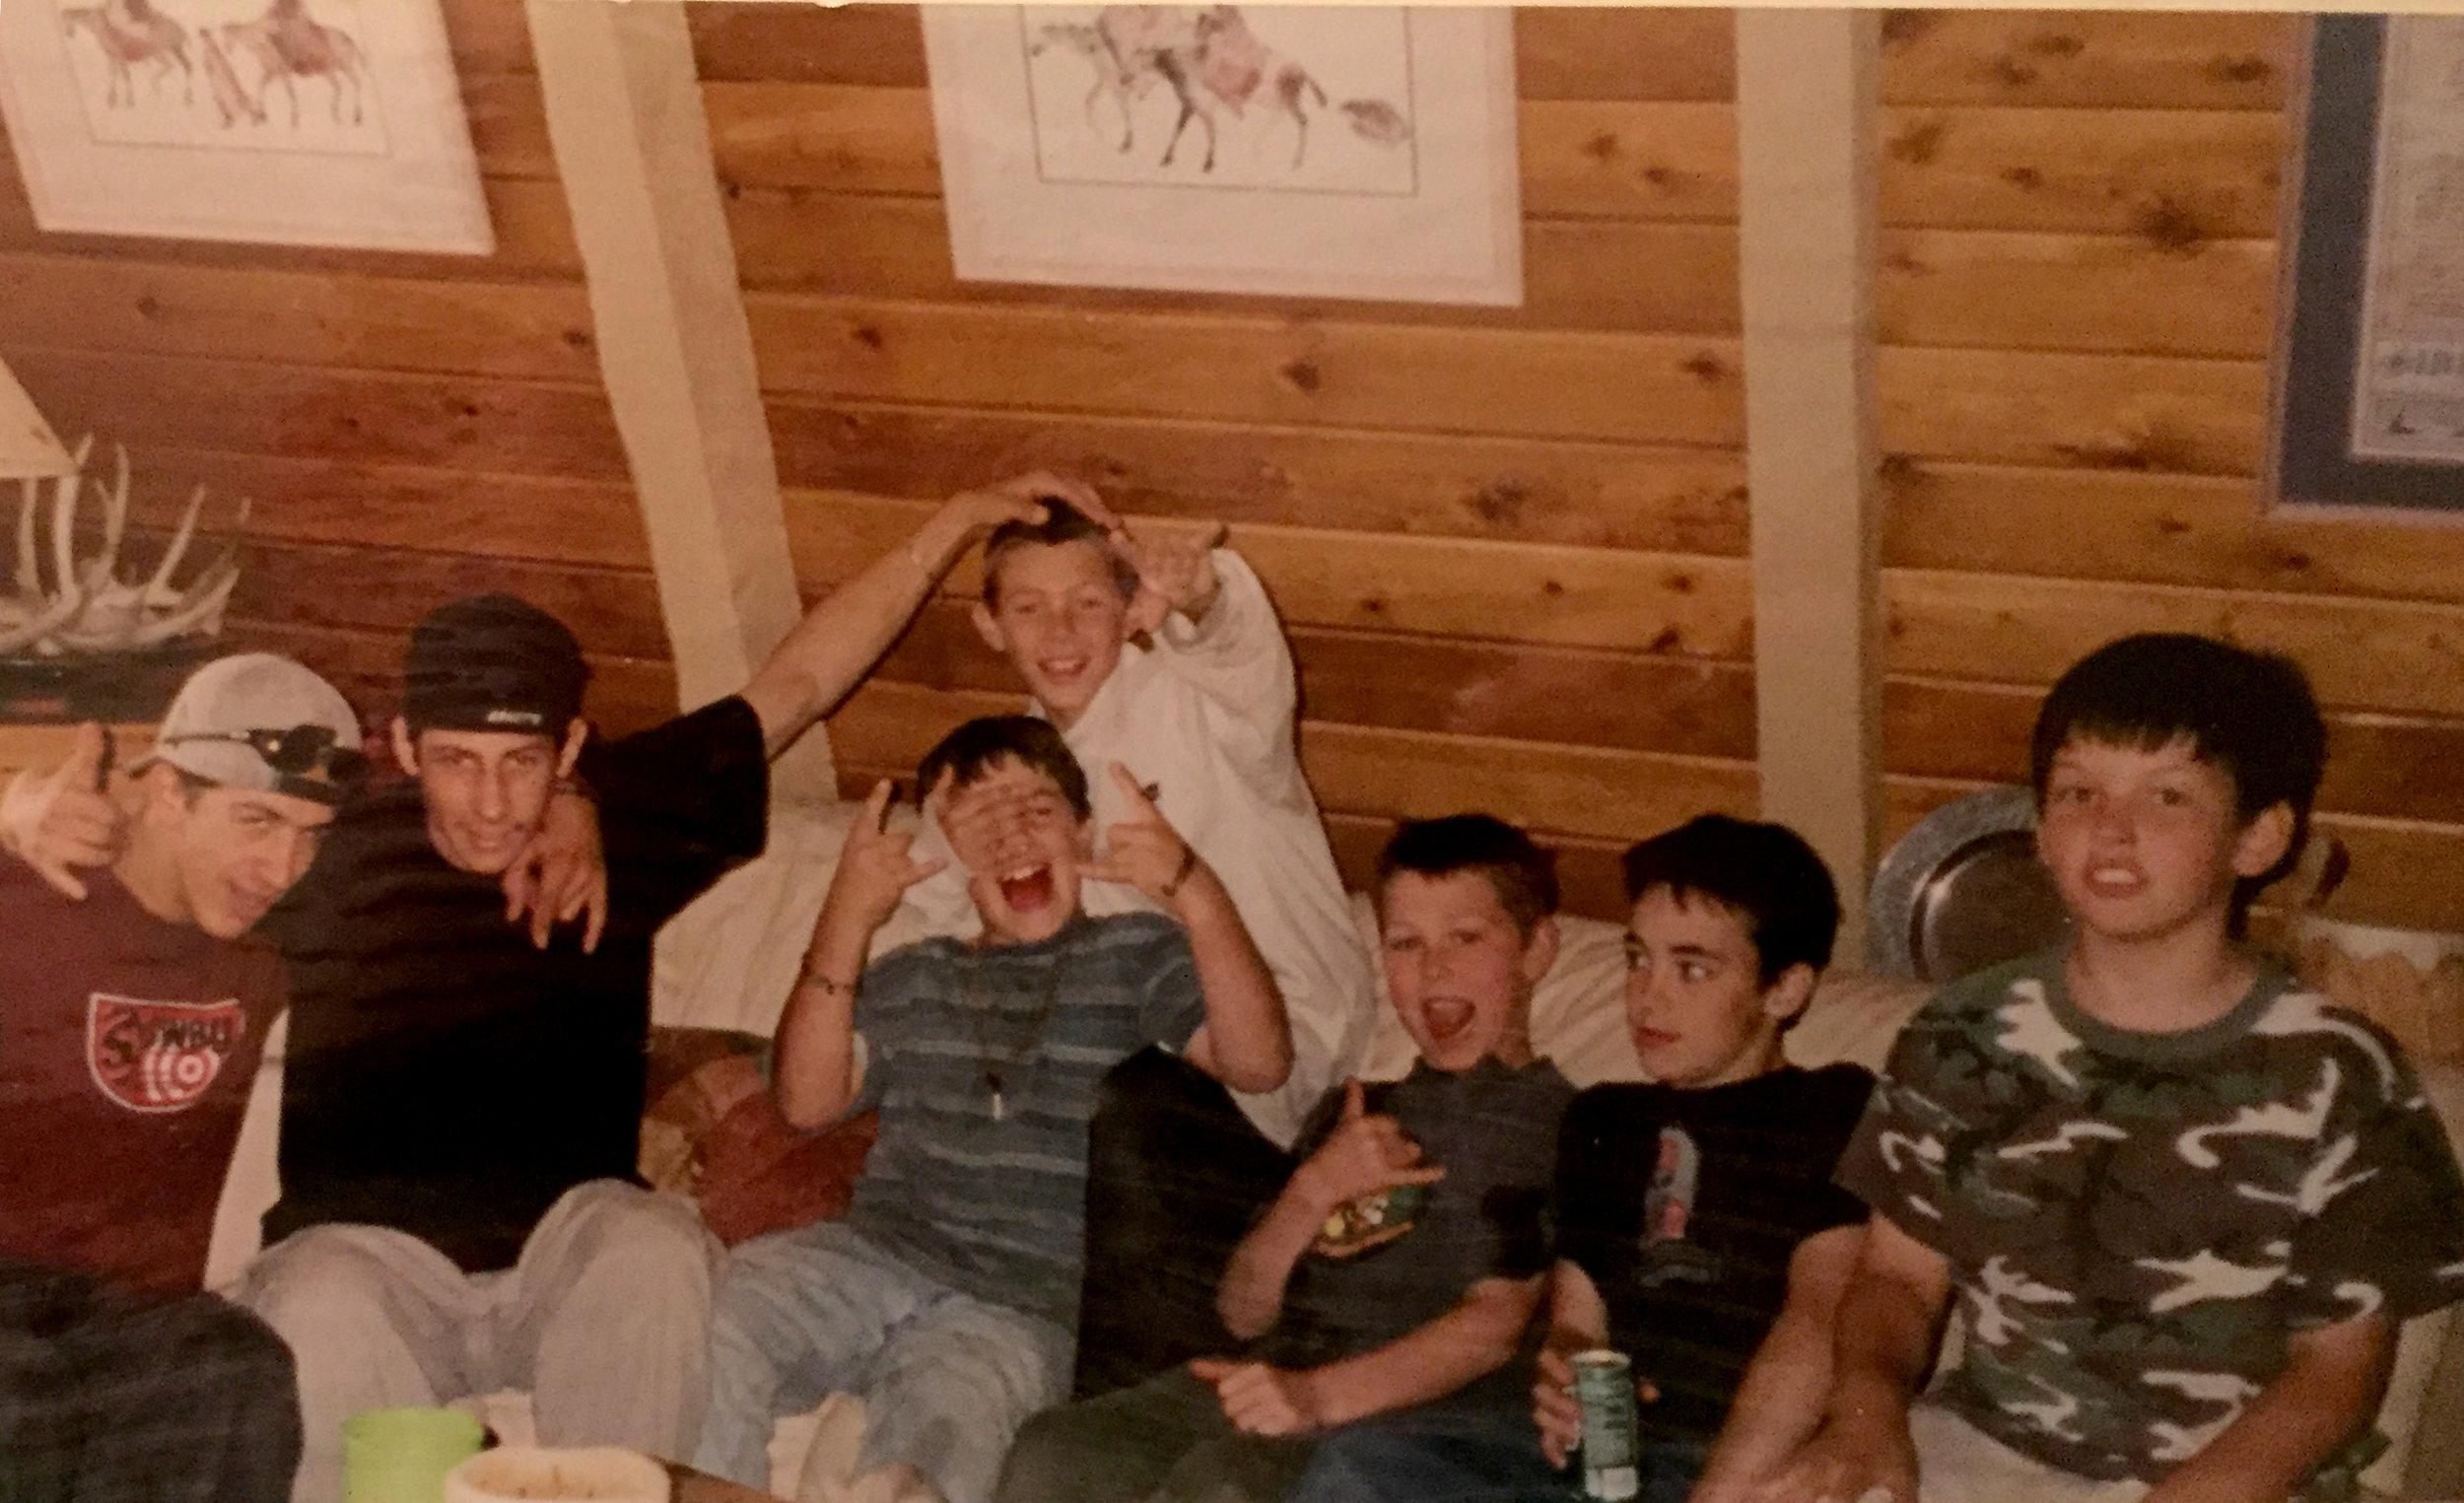 Noah, David, Sammy, Cody, Gus copy.jpg